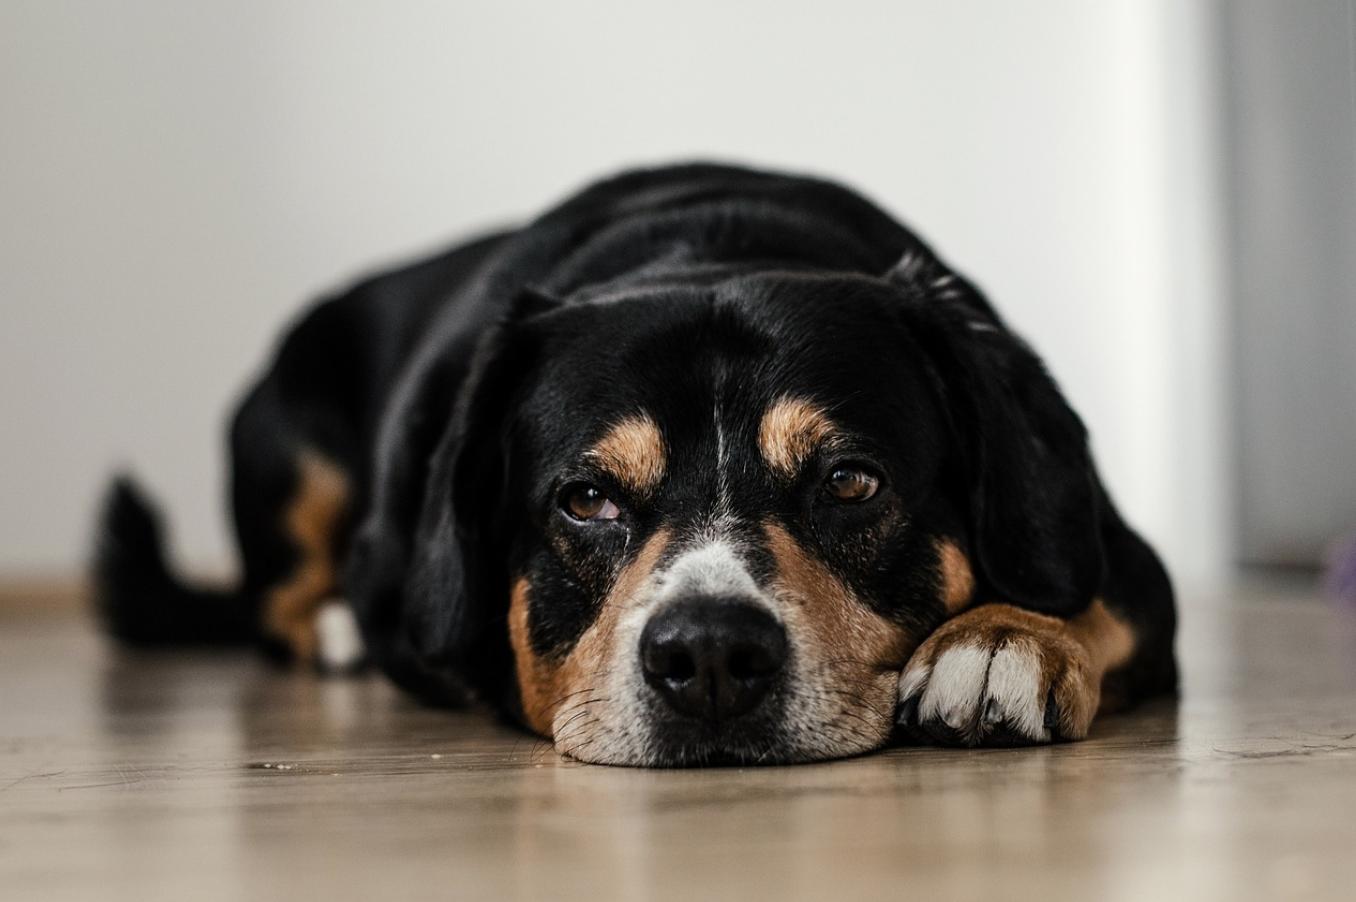 black and brown dog sleeping on a wood floor